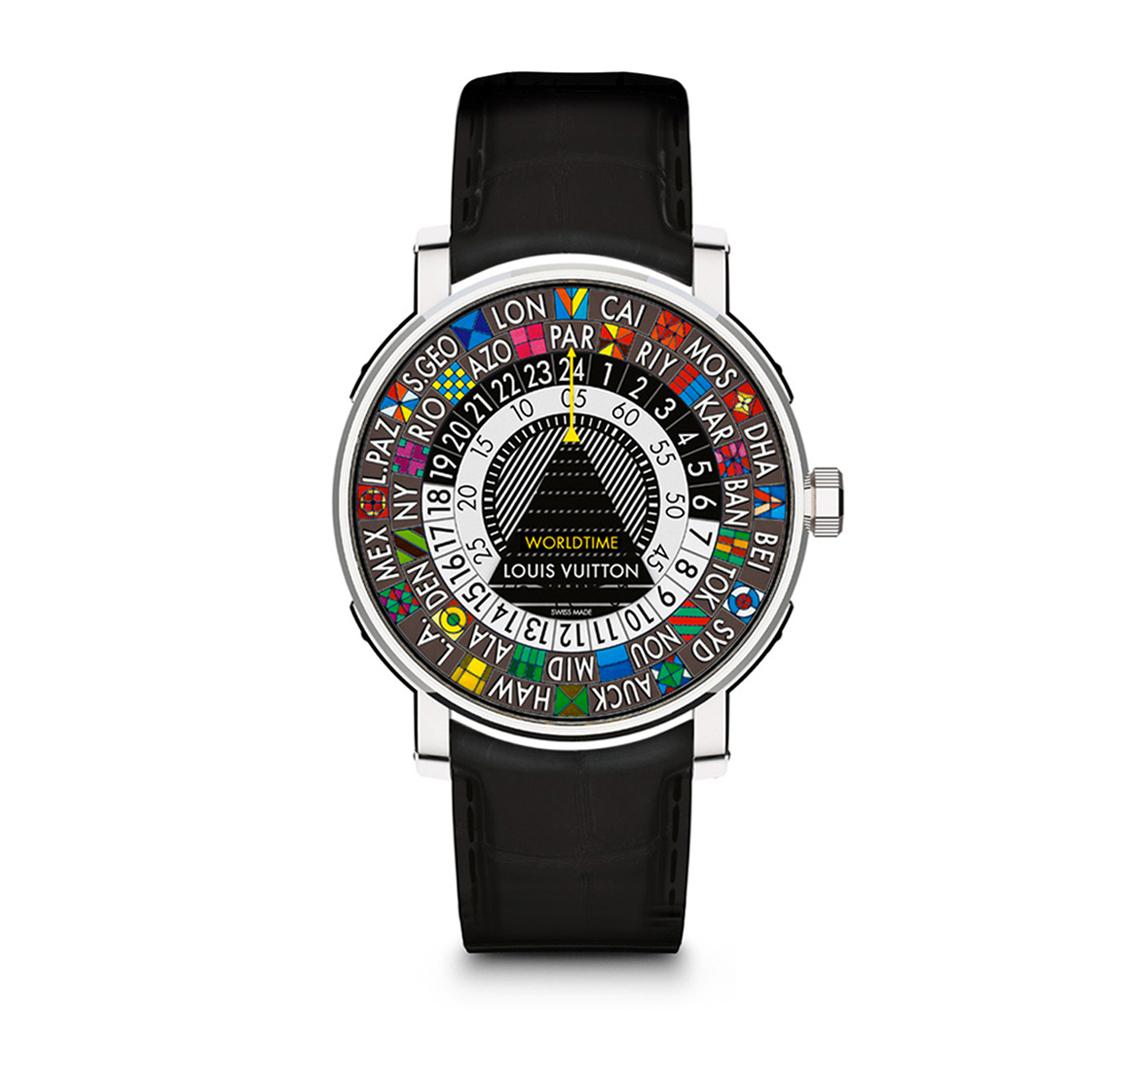 Worldtime dial : Worldtime dial